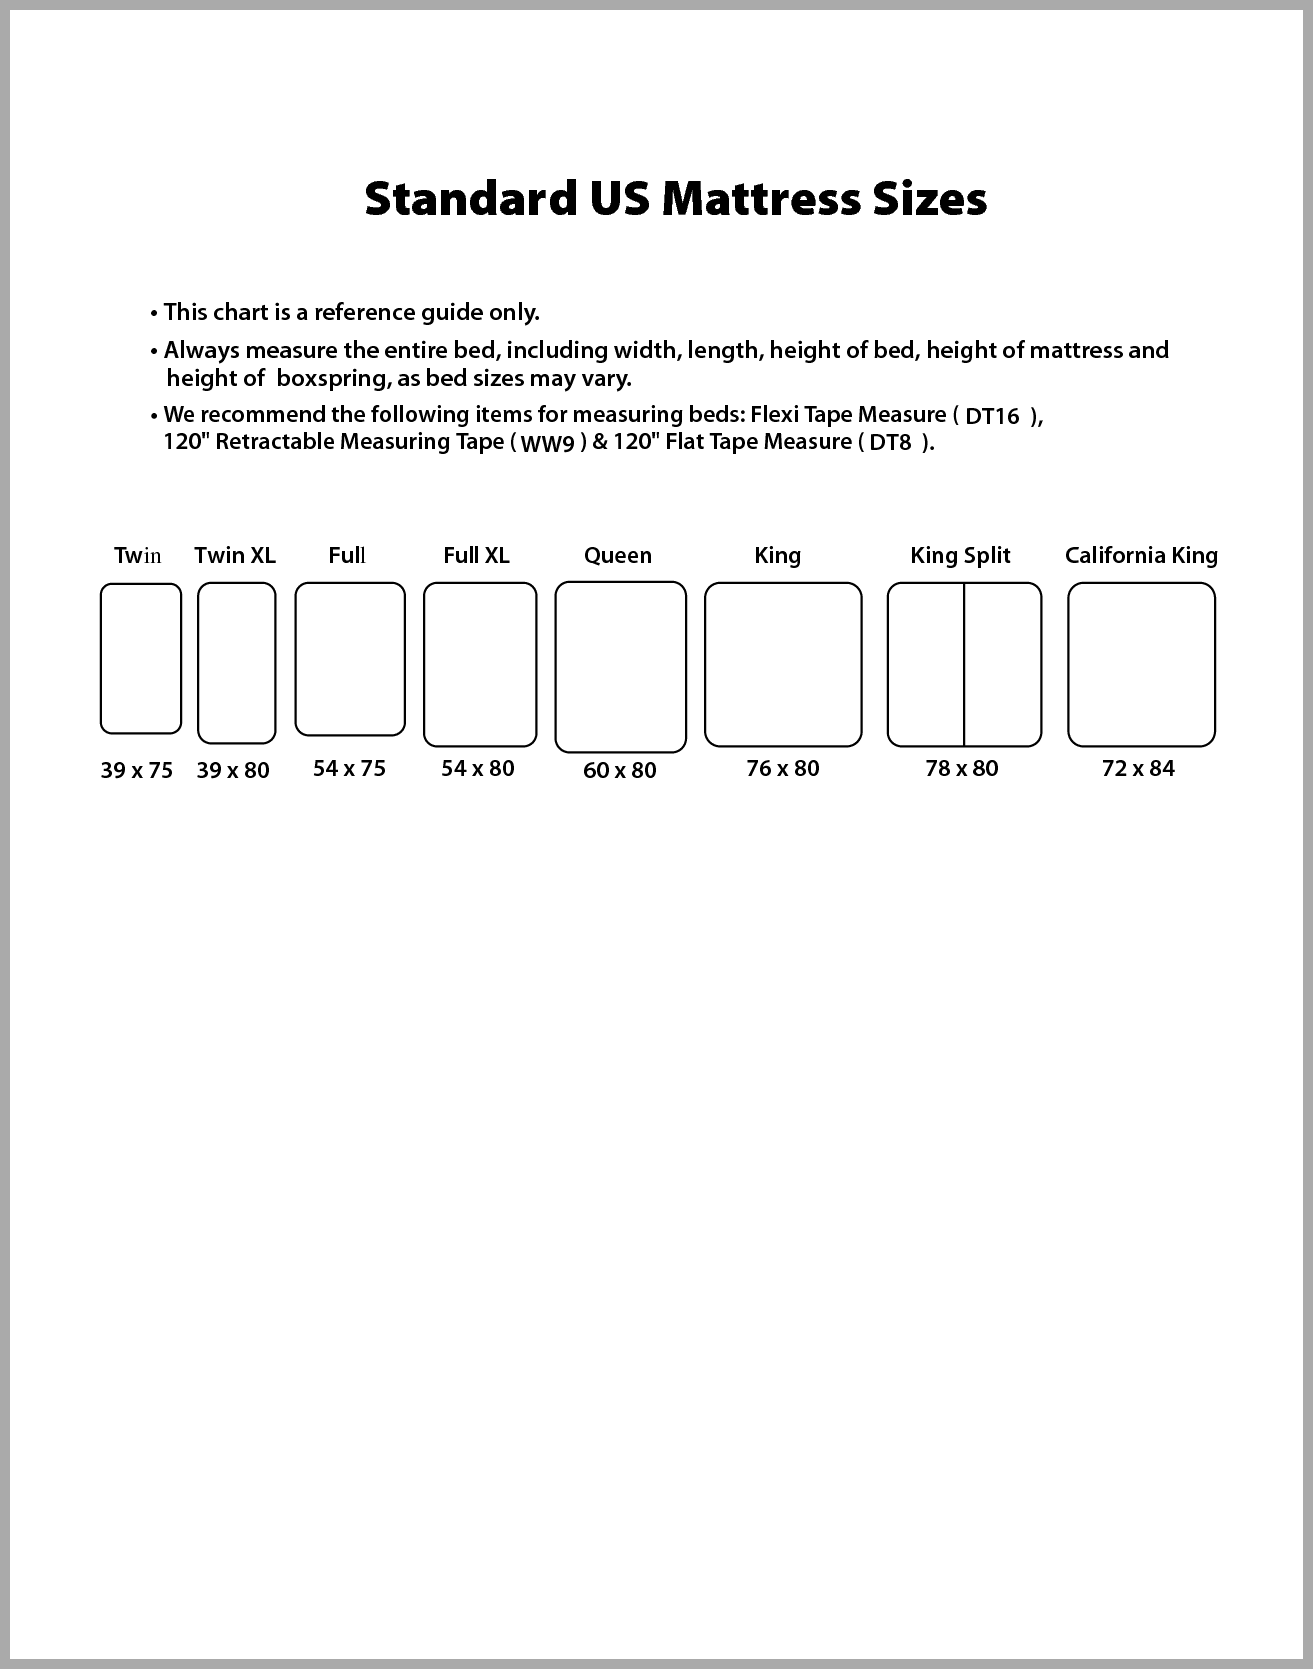 Size Of A Crib Mattress Standard Size Crib Mattress Standard Size Crib Mattress 17973 Mattress Sizes Cradle Mattress Mattress